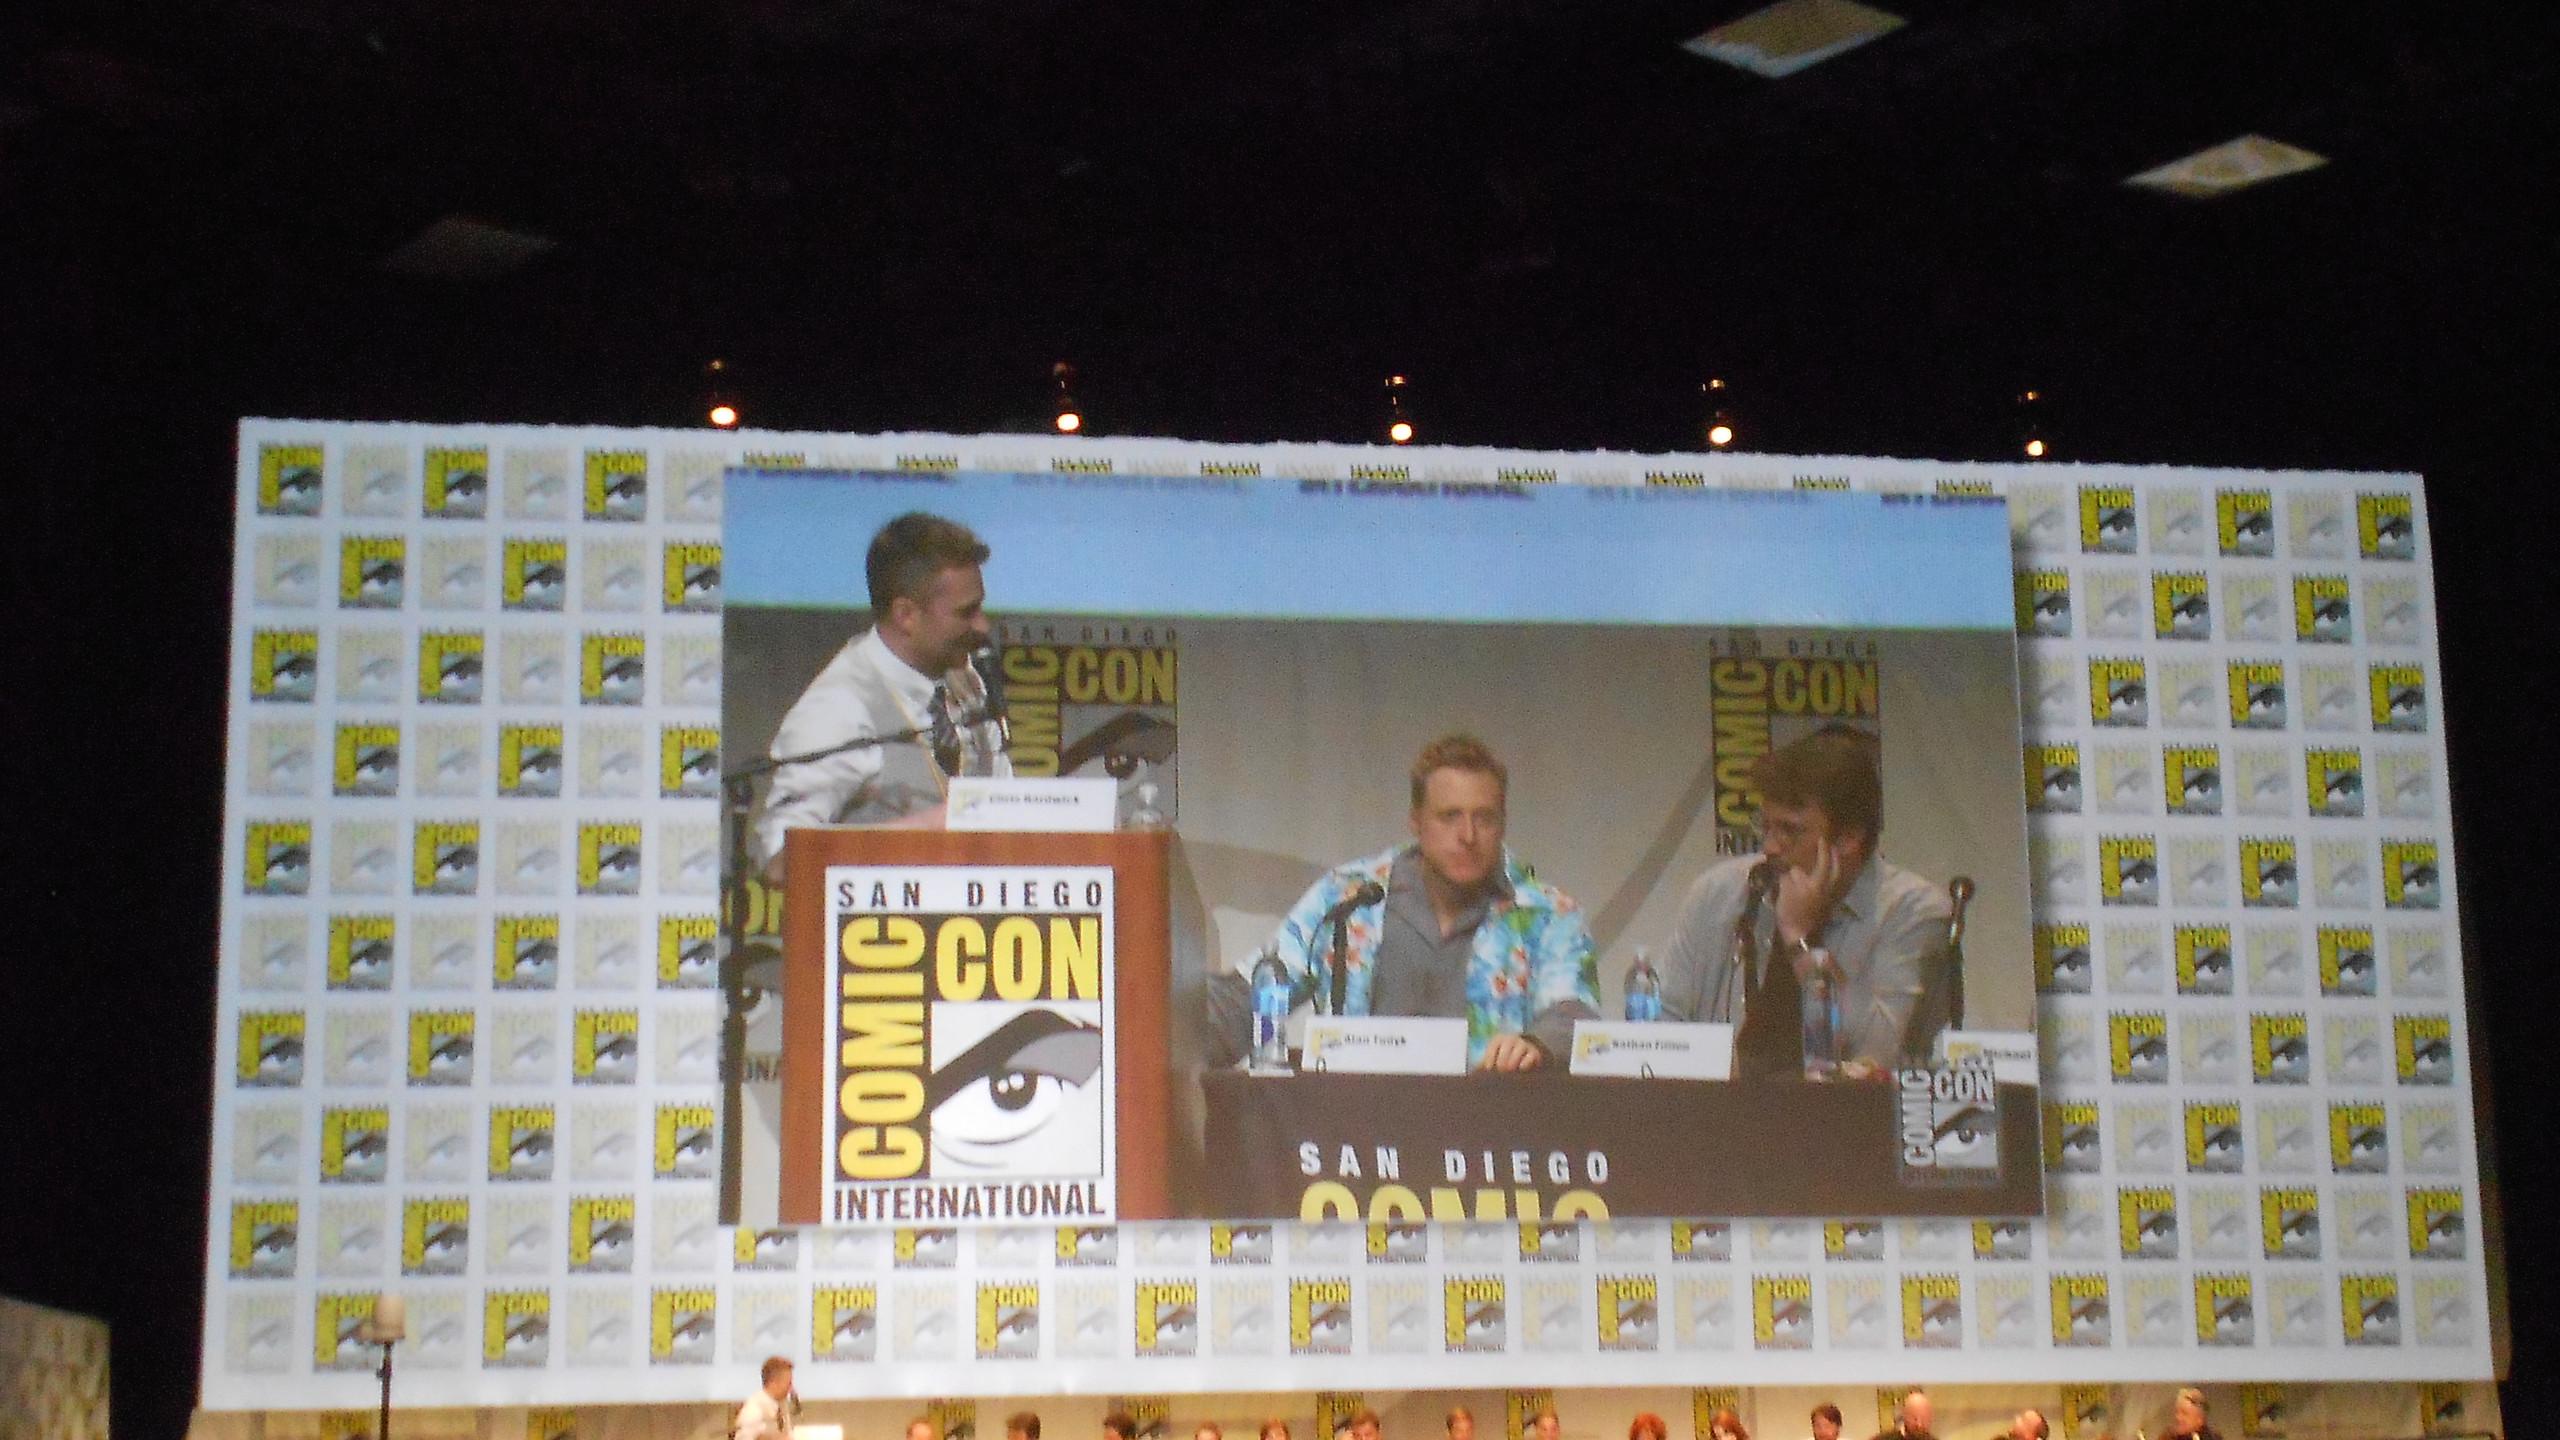 San Diego, Comic-Con, convention, SDCC, Con Man, Alan Tudyk, Nathan Fillion